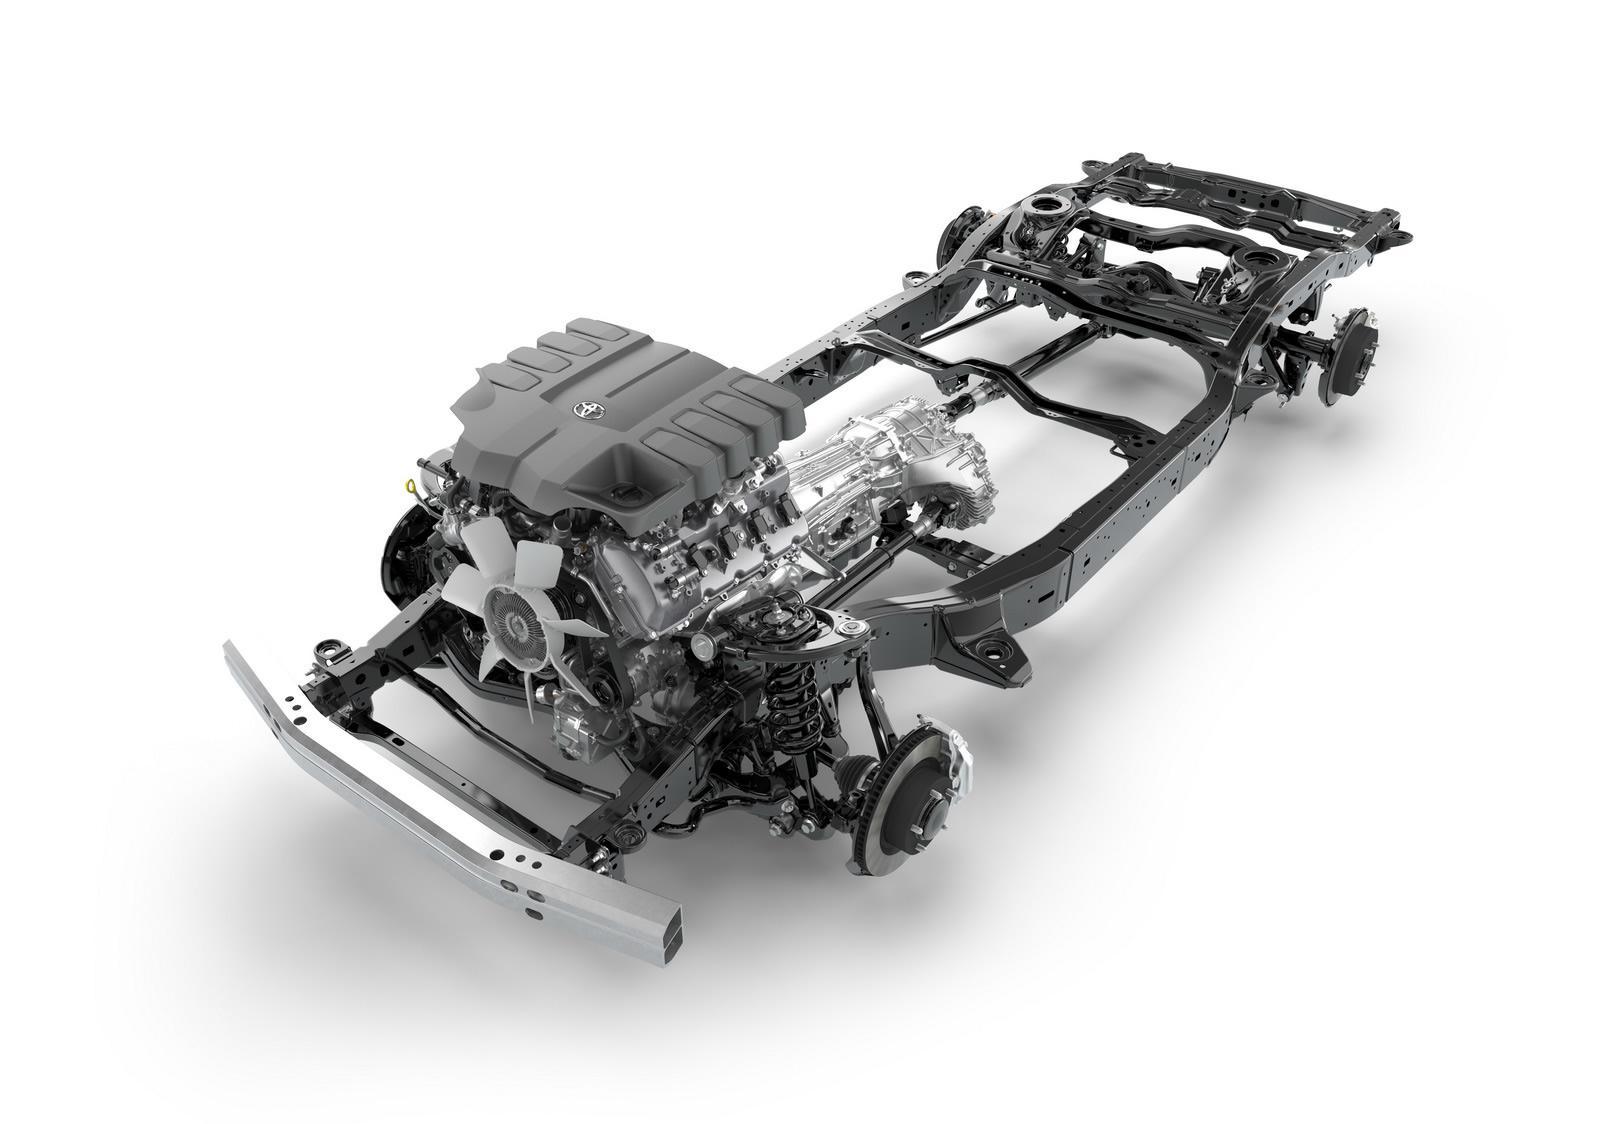 2016-toyota-landcruiser-200-series-facelift-drivetrain - ForceGT.com